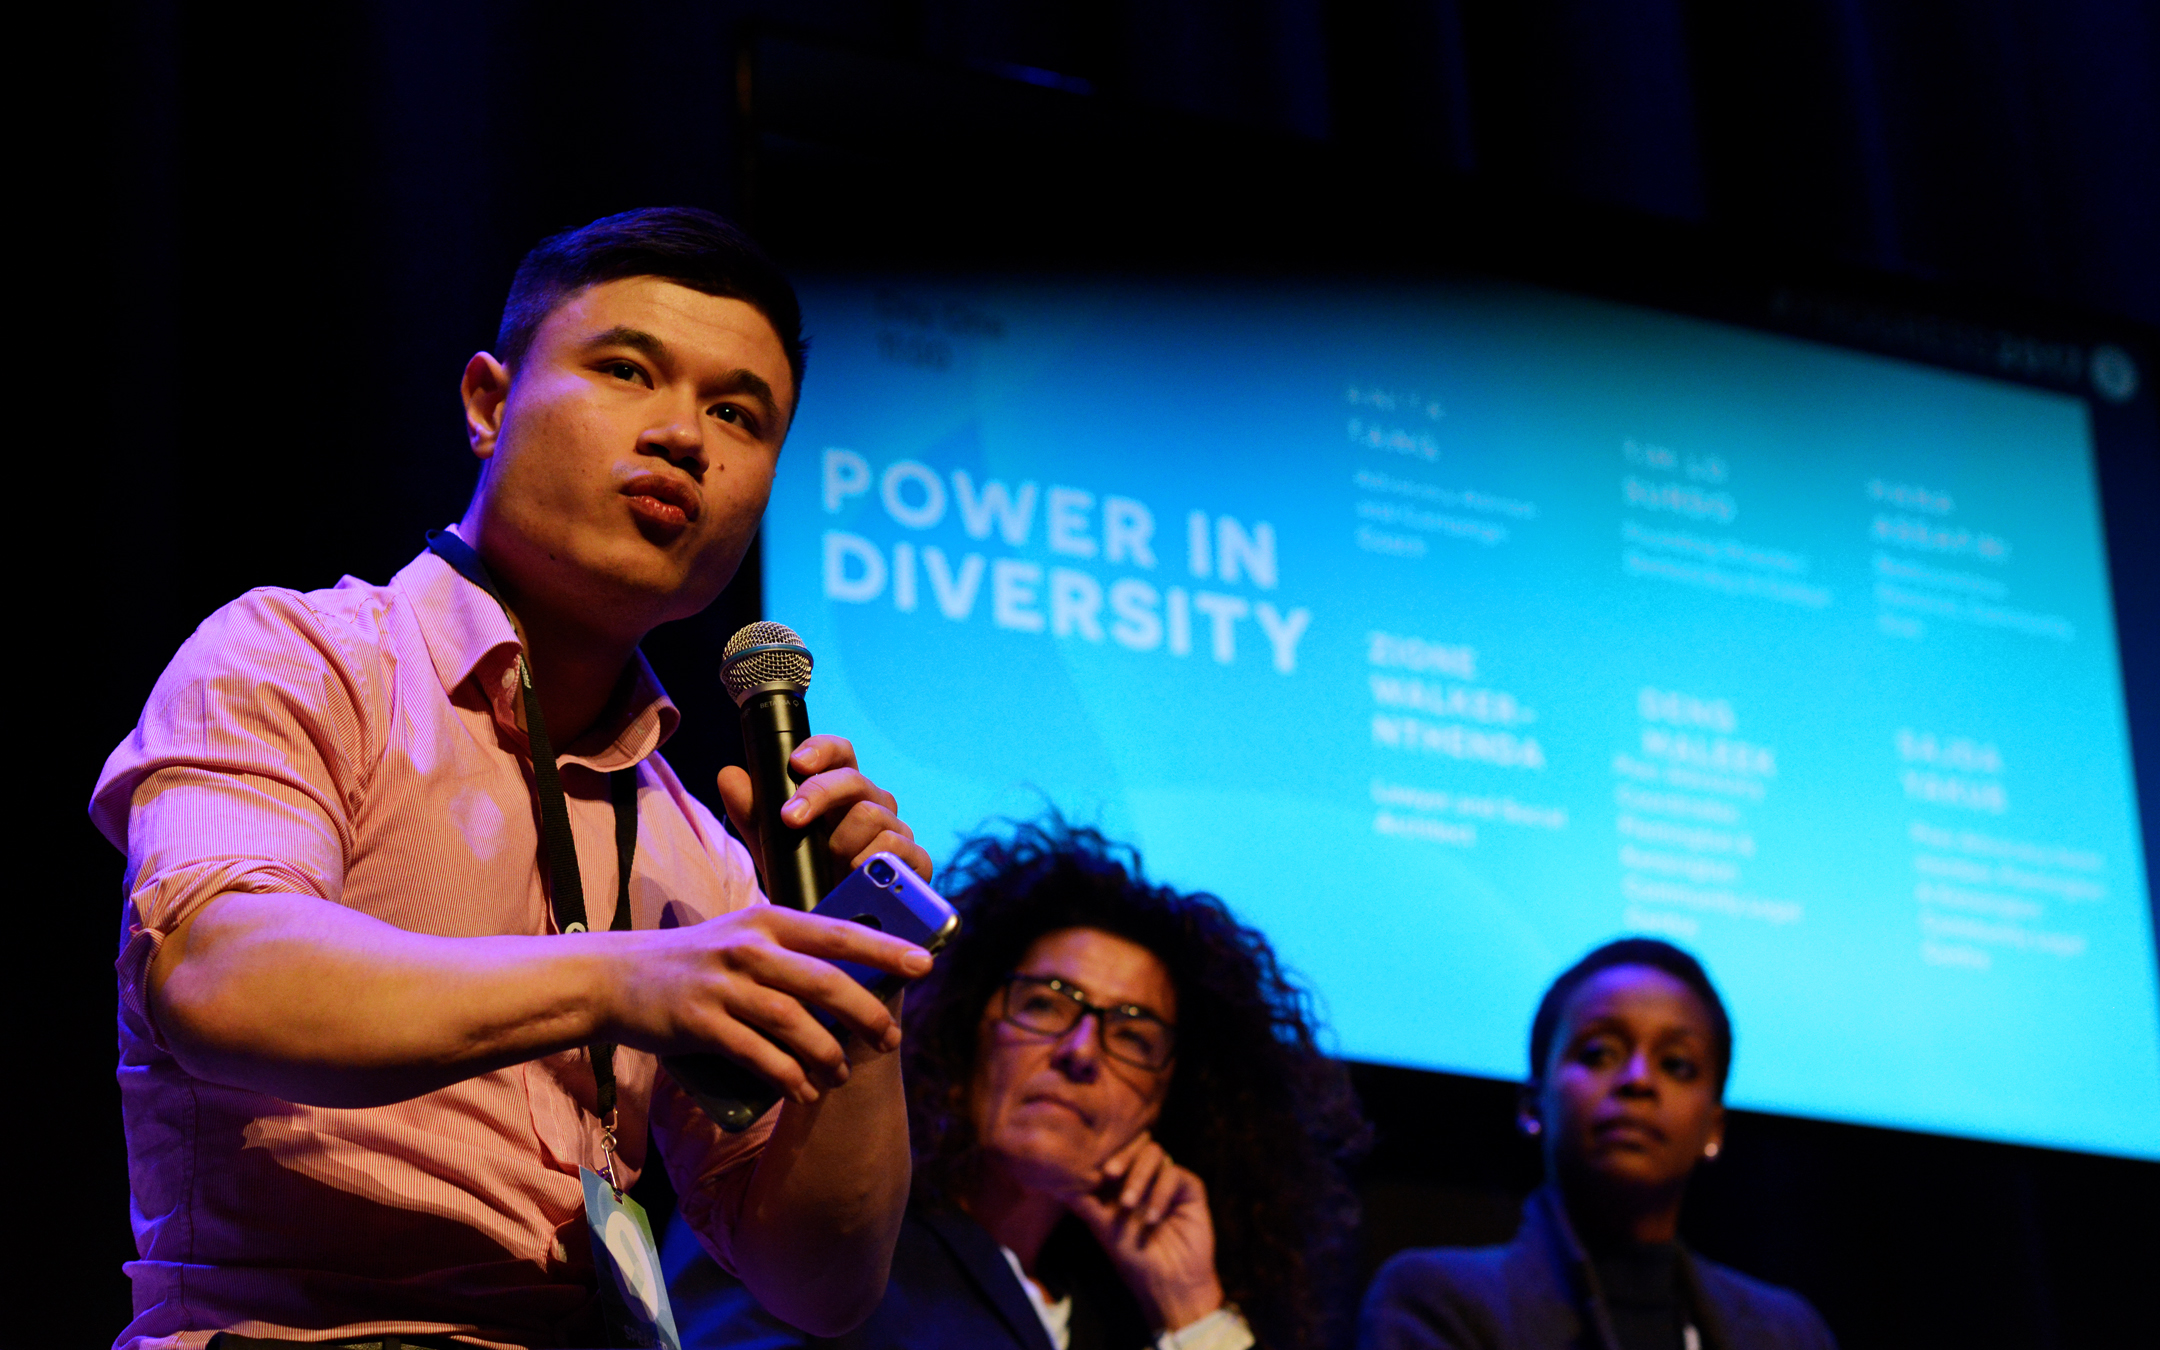 Power in Diversity